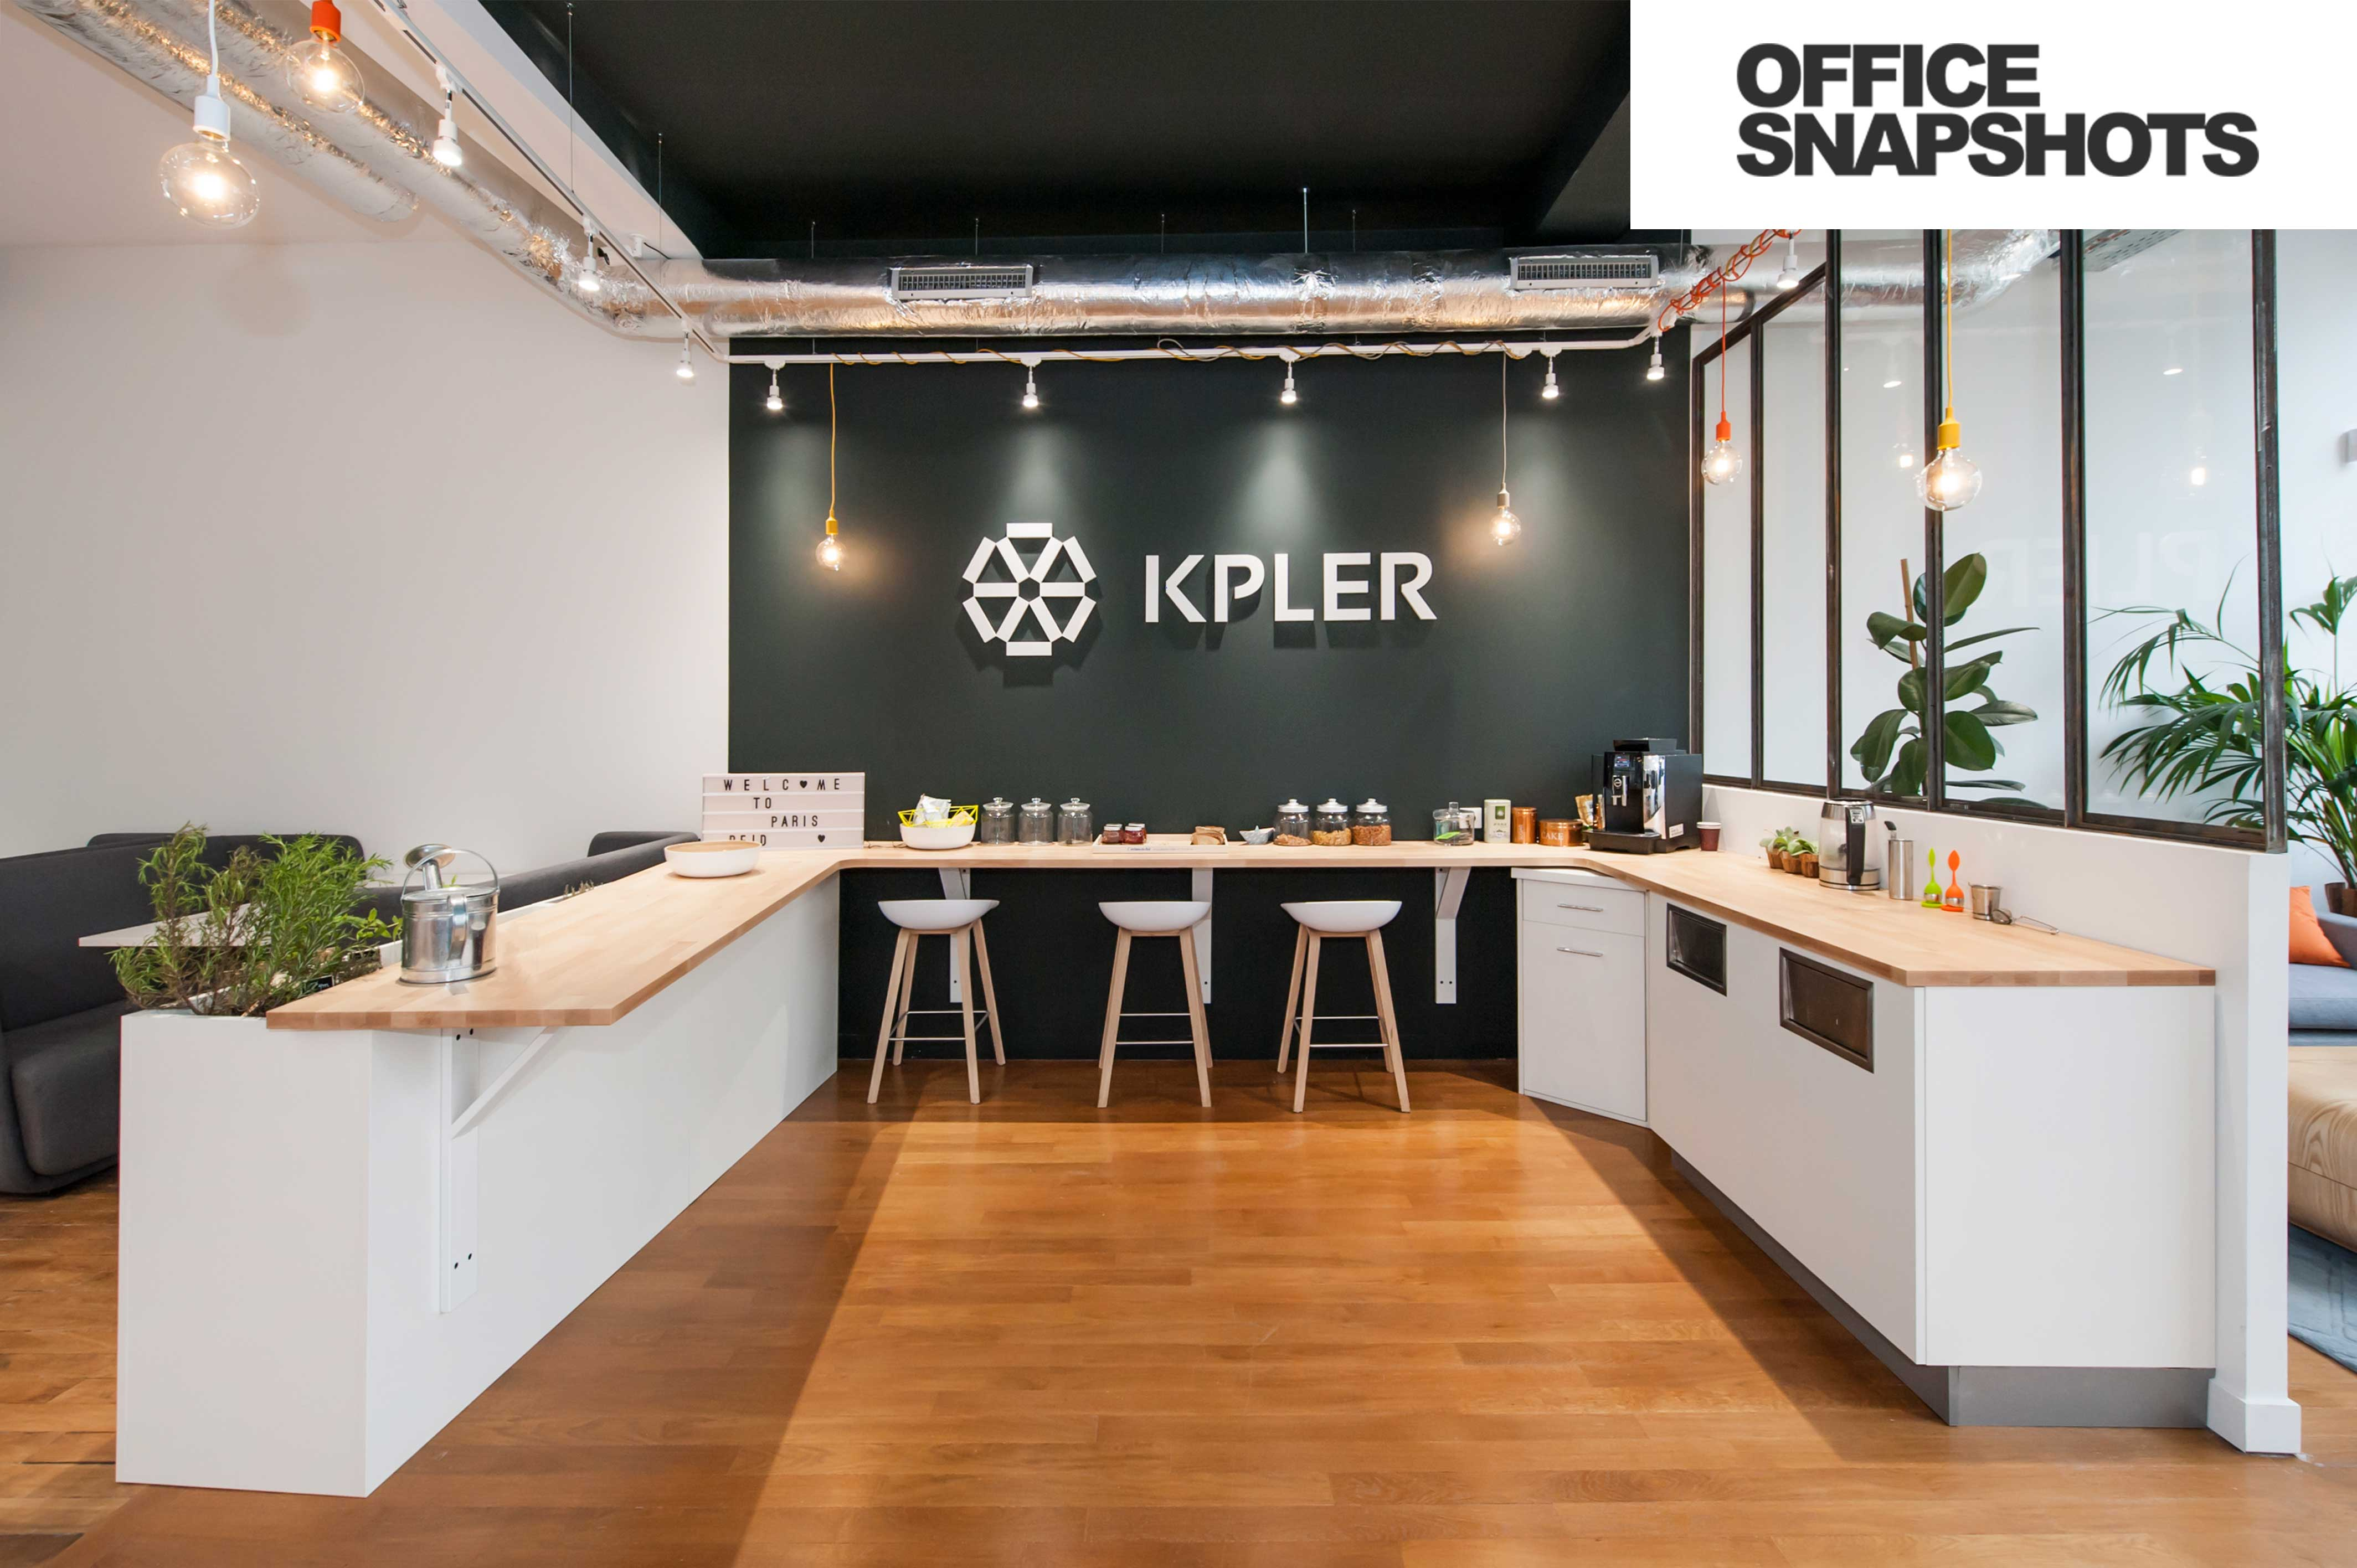 The Kpler achievement in Office Snapshots